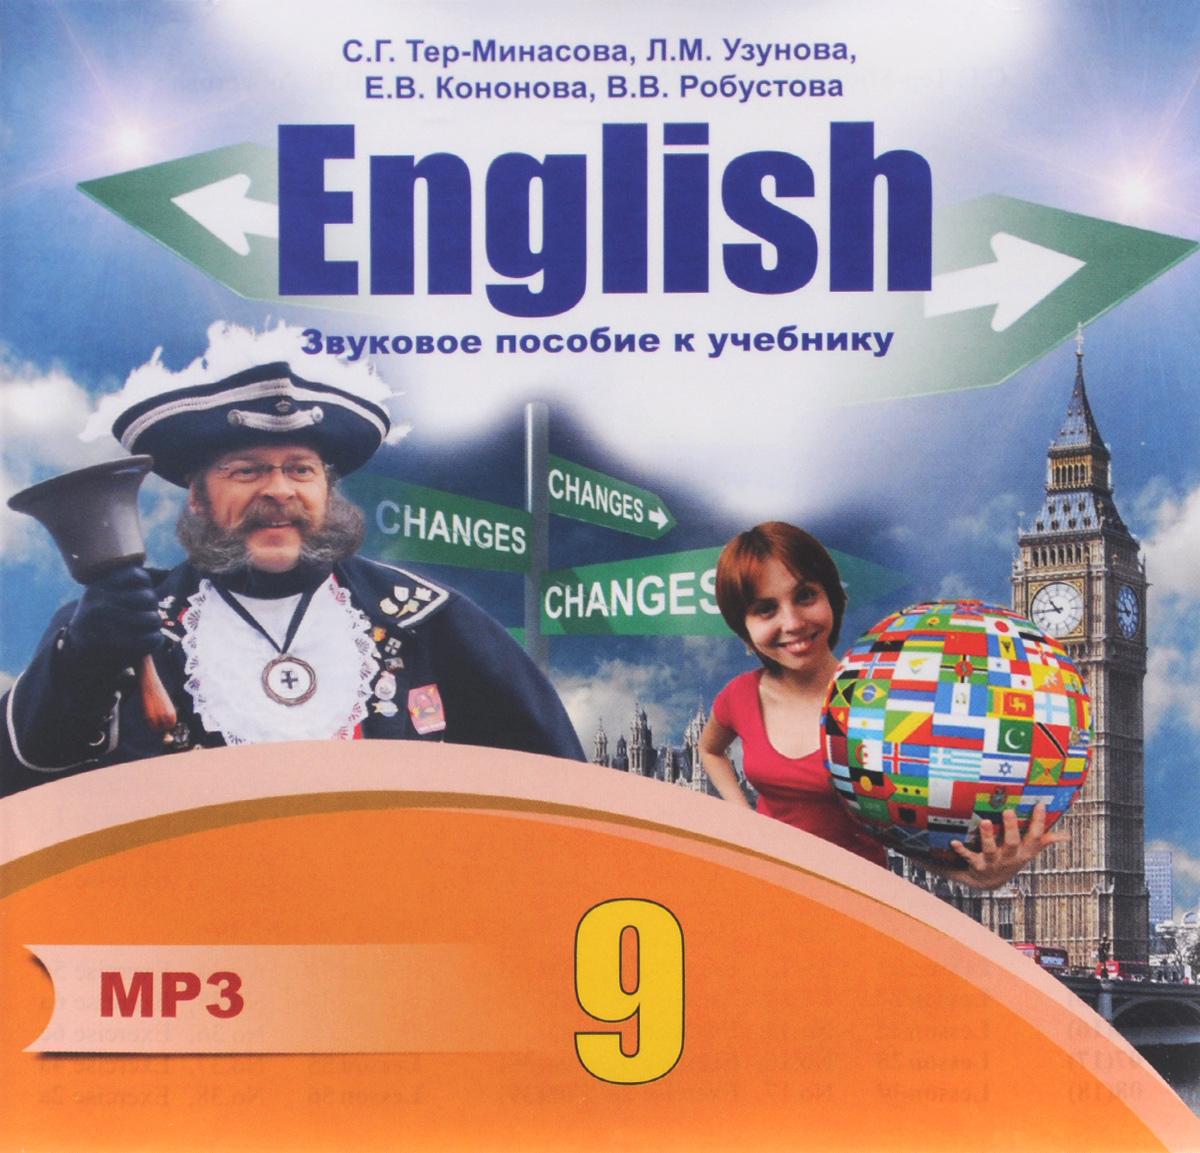 English 9 / Английский язык. 9 класс. Звуковое пособие к учебнику (аудиокурс на MP3)